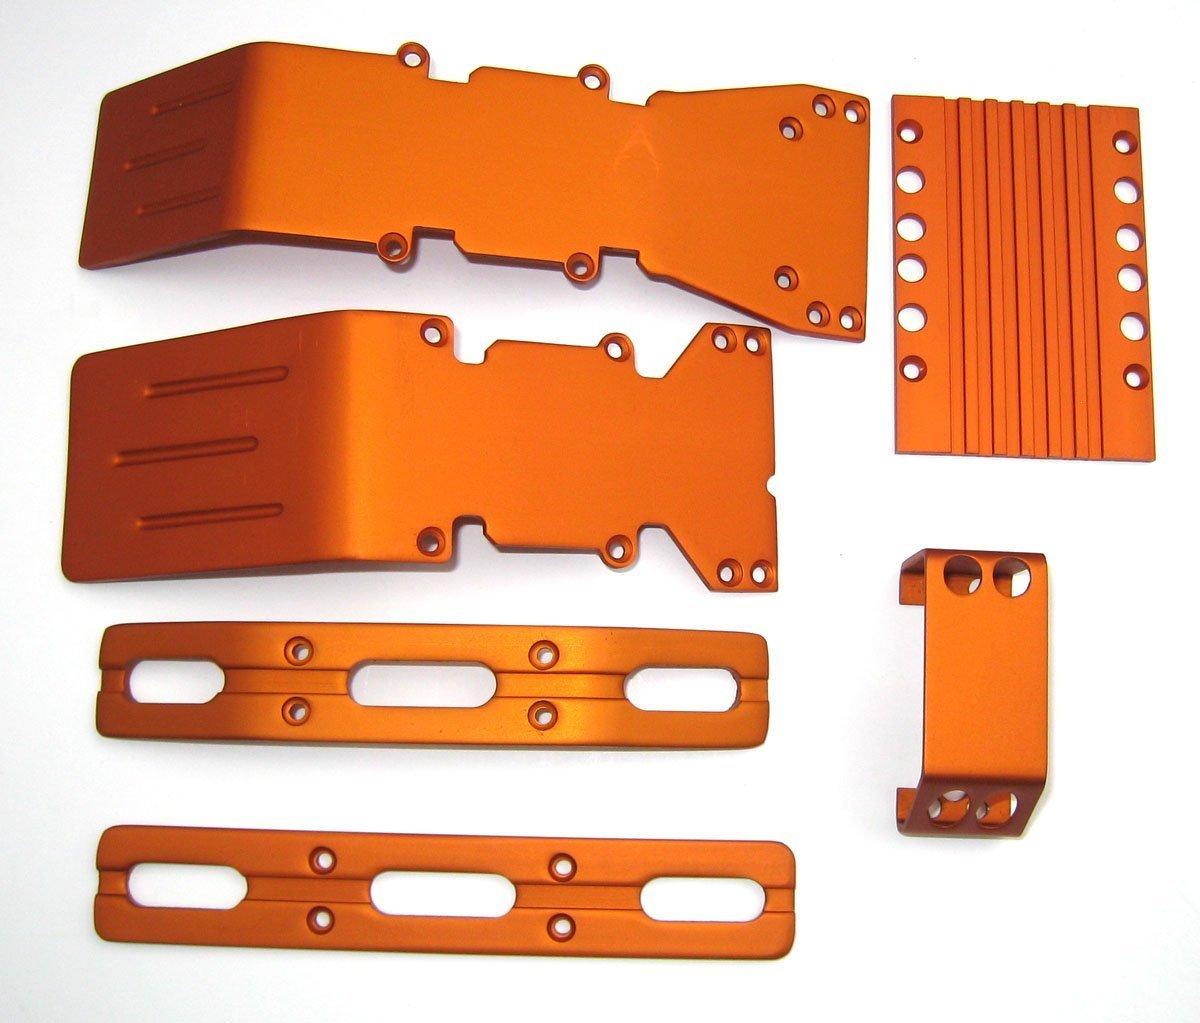 E-Maxx Orange Anodized Aluminum skid plate set T-Maxx